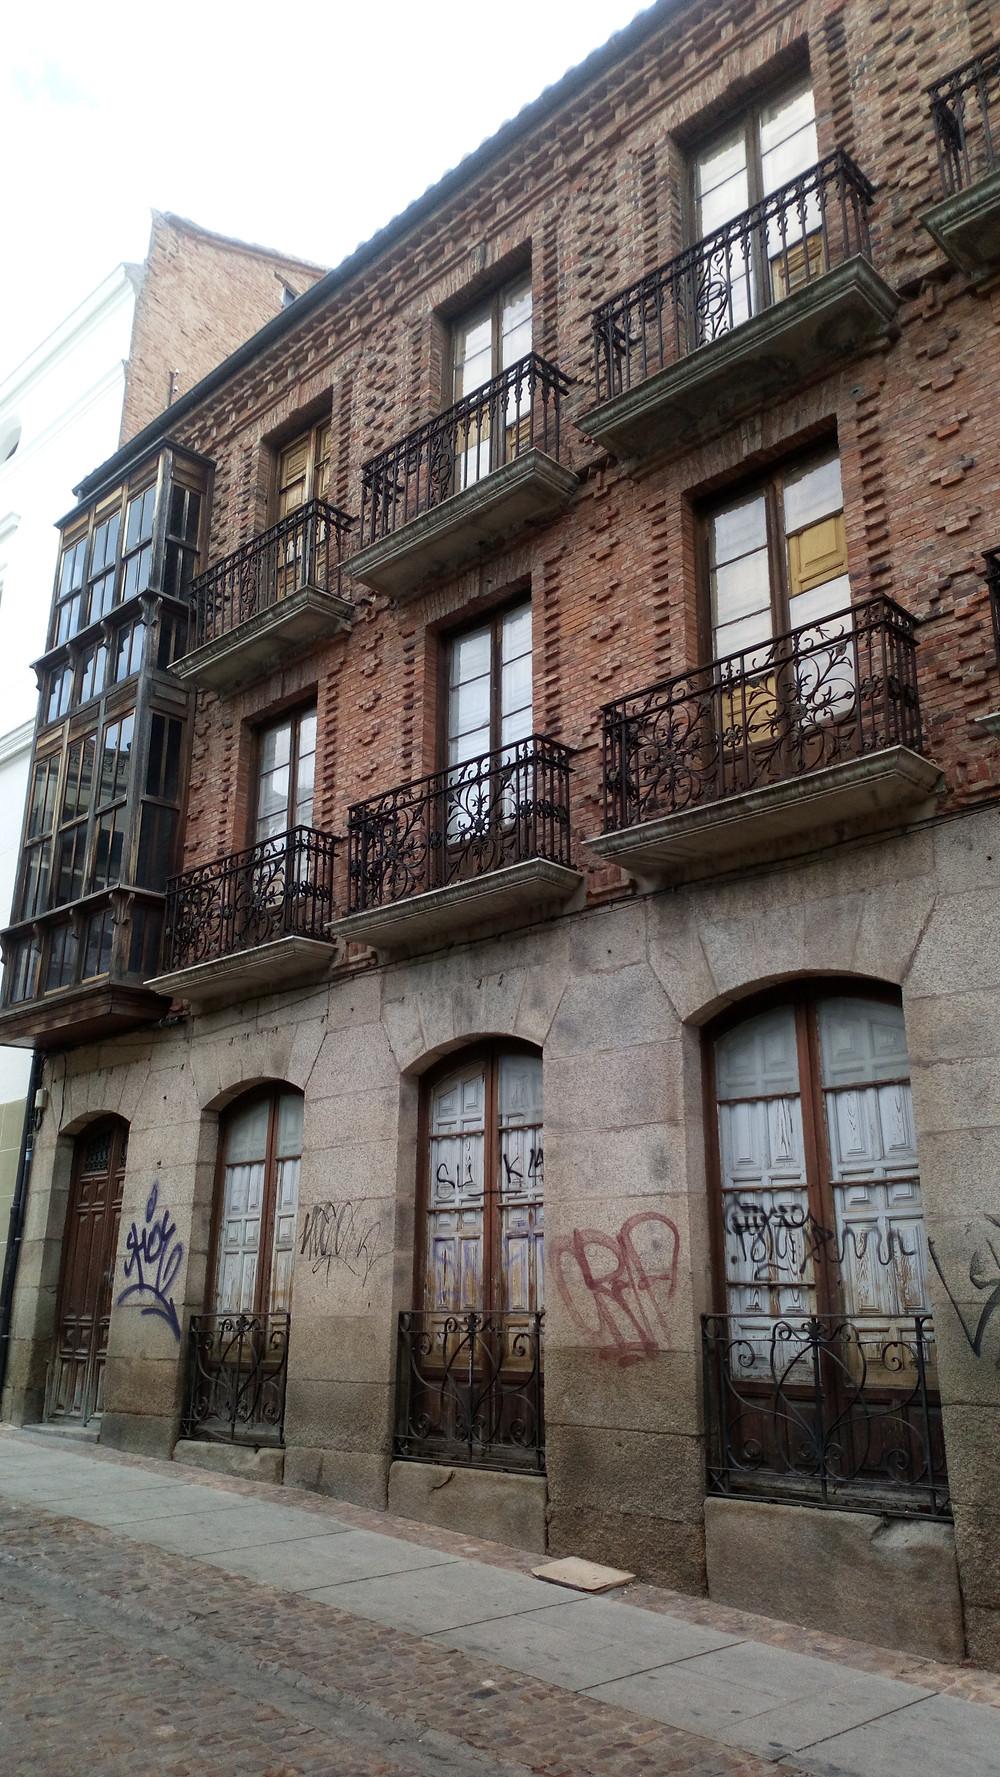 Fachada de ladrillo tradicional. Edificio de viviendas en Zamora